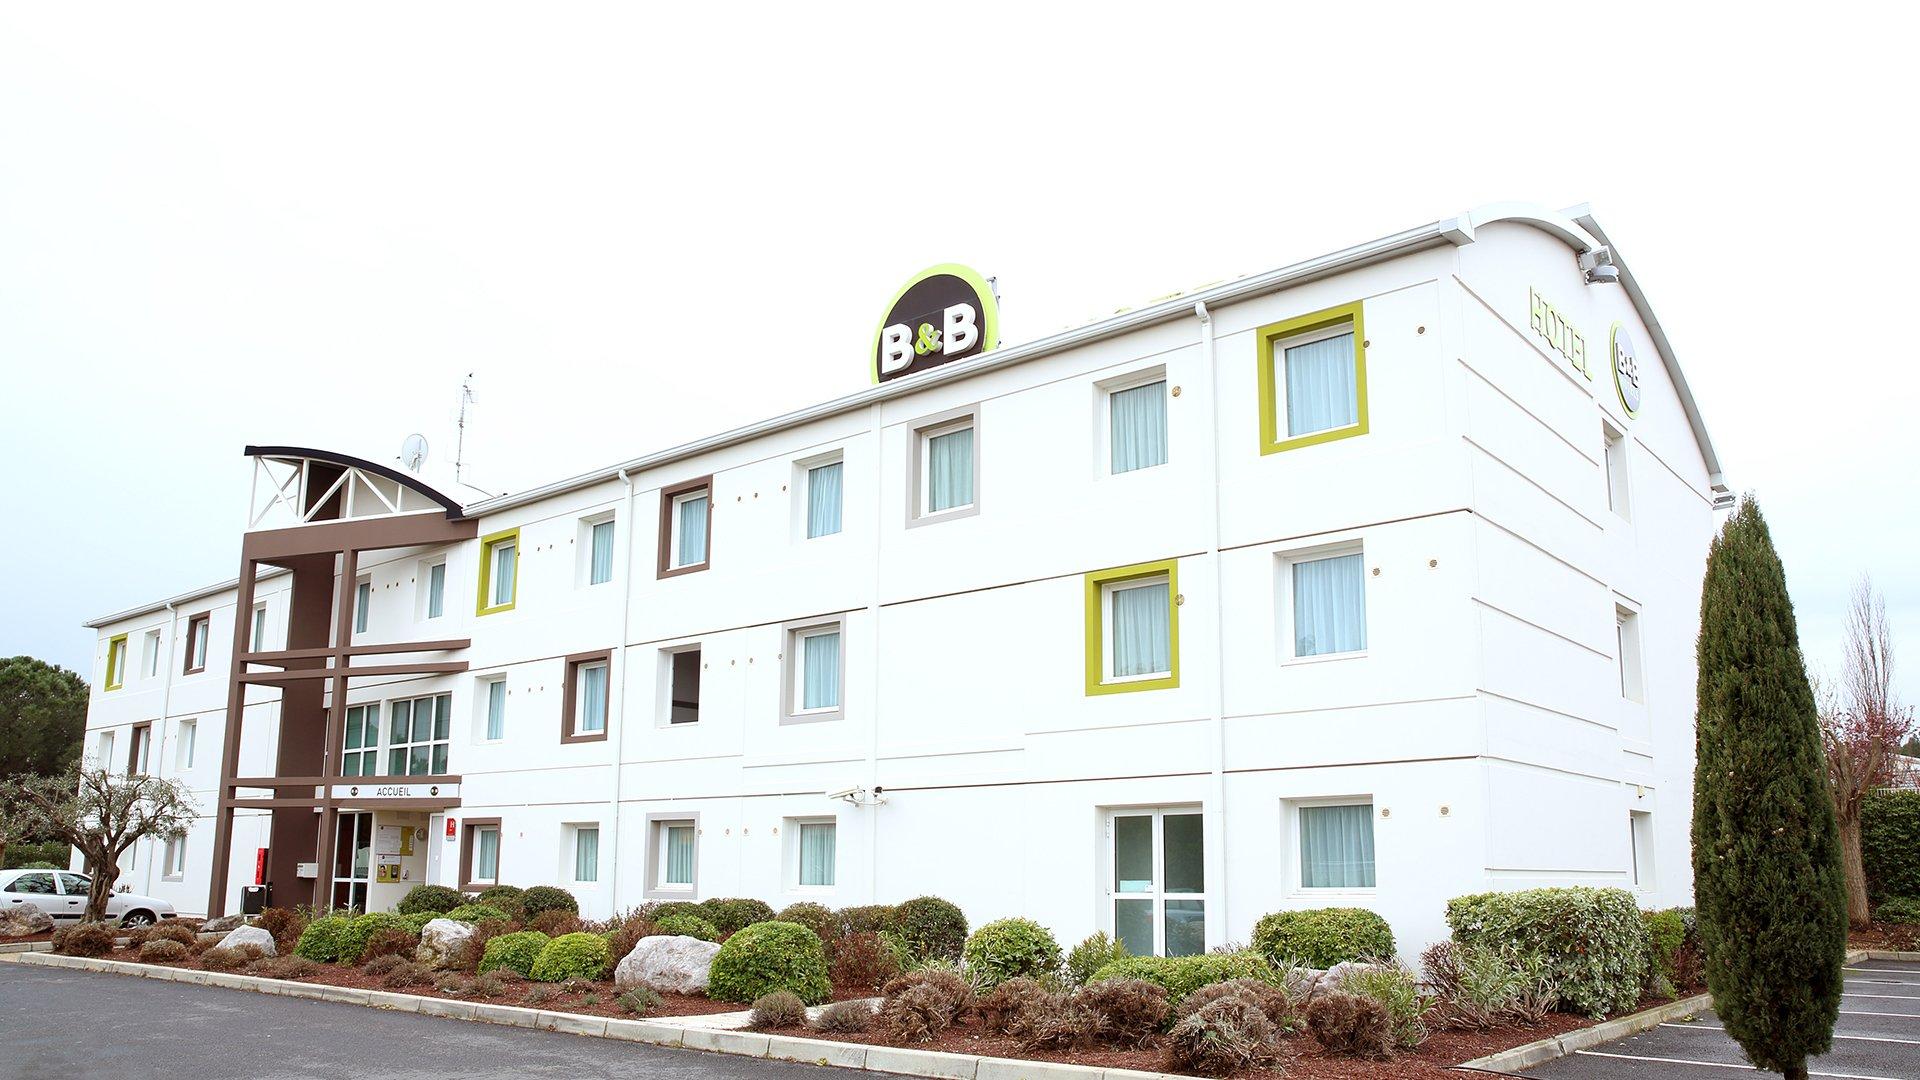 B&B Hotel Beziers